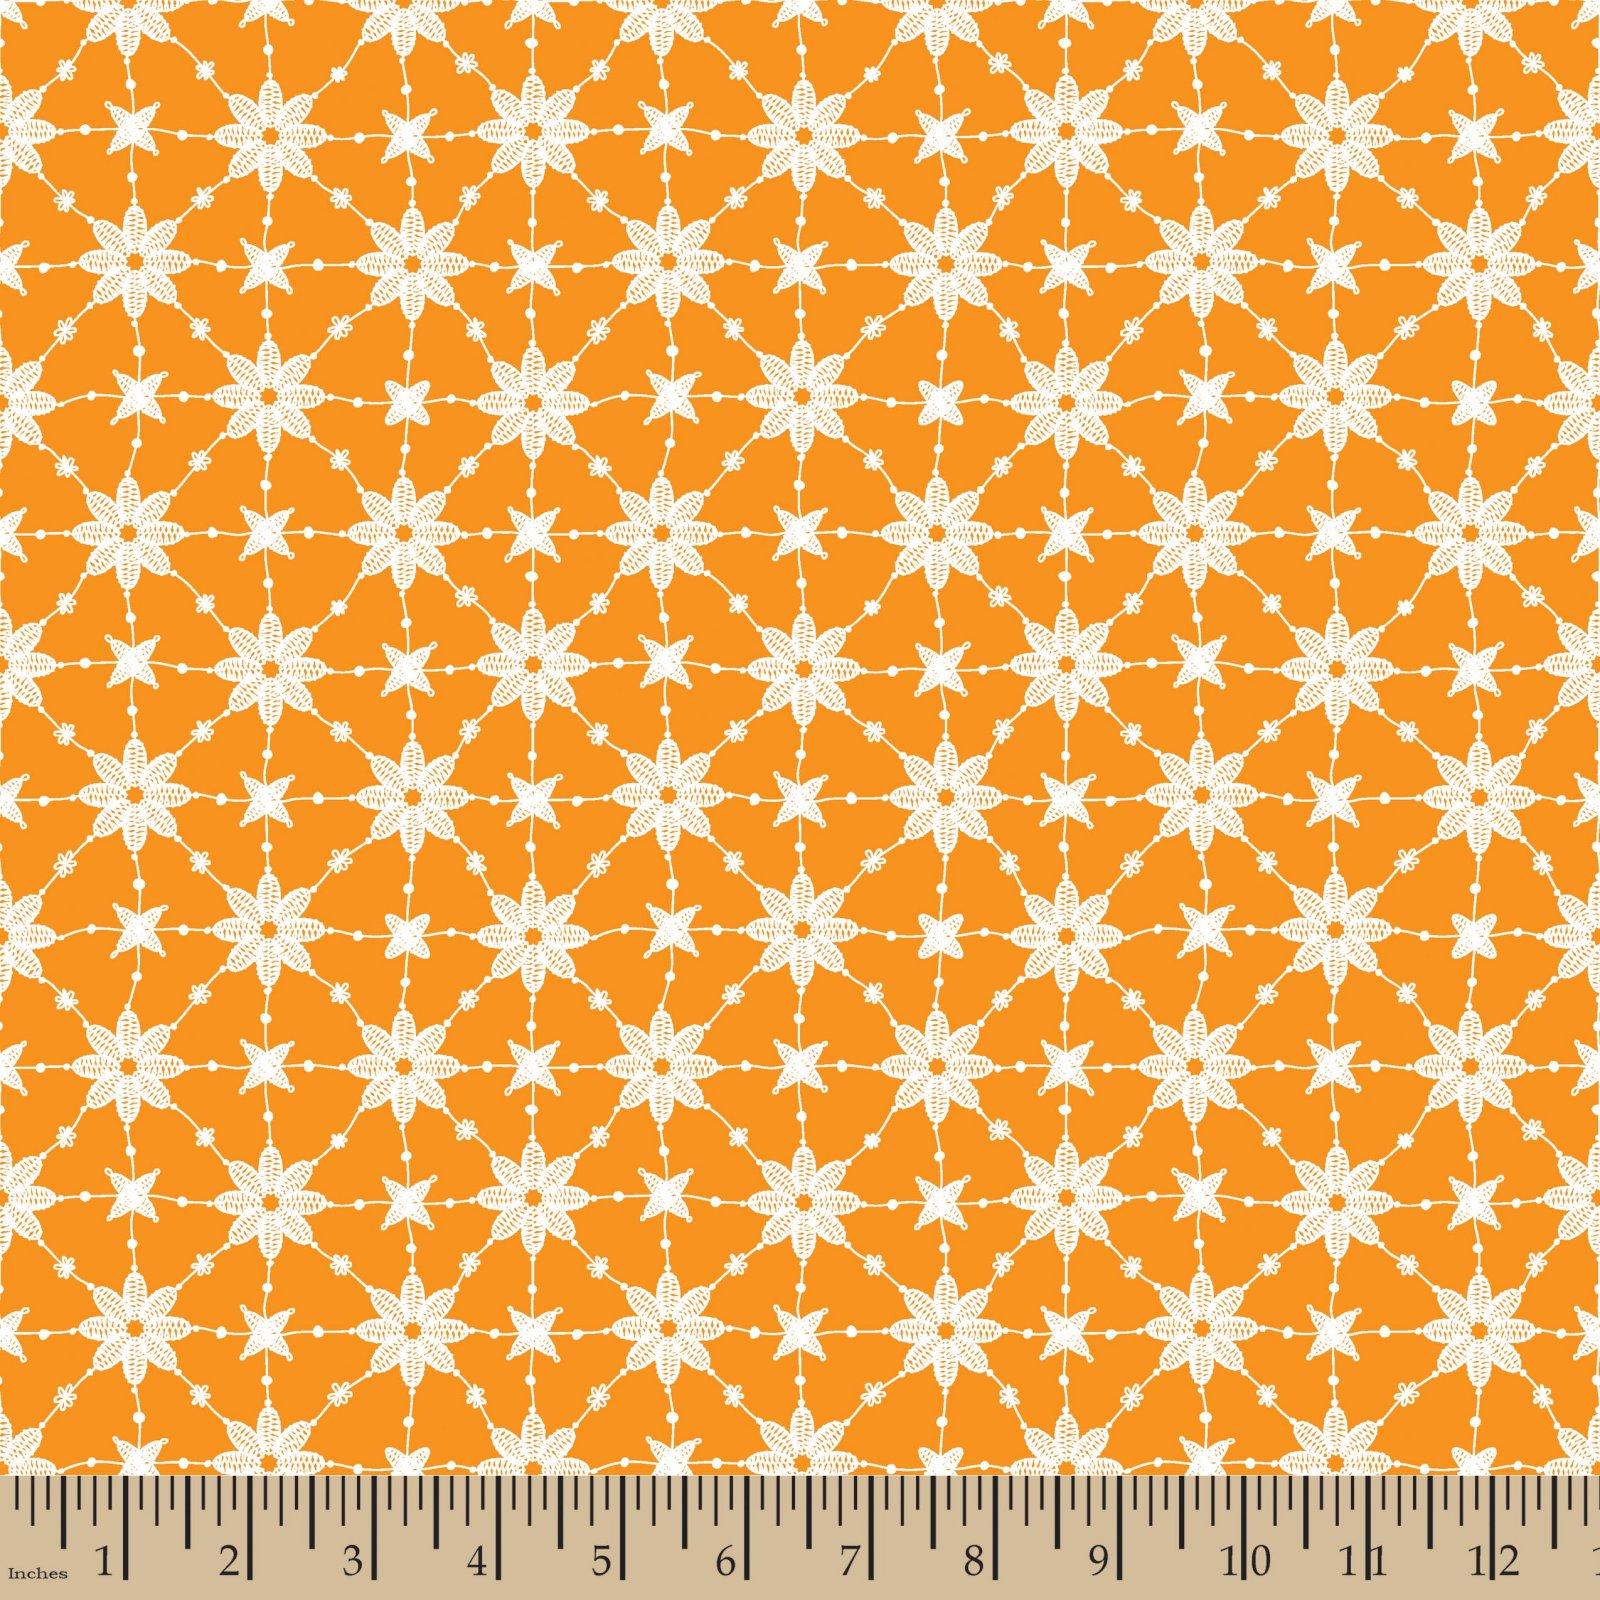 Embroidery Orange